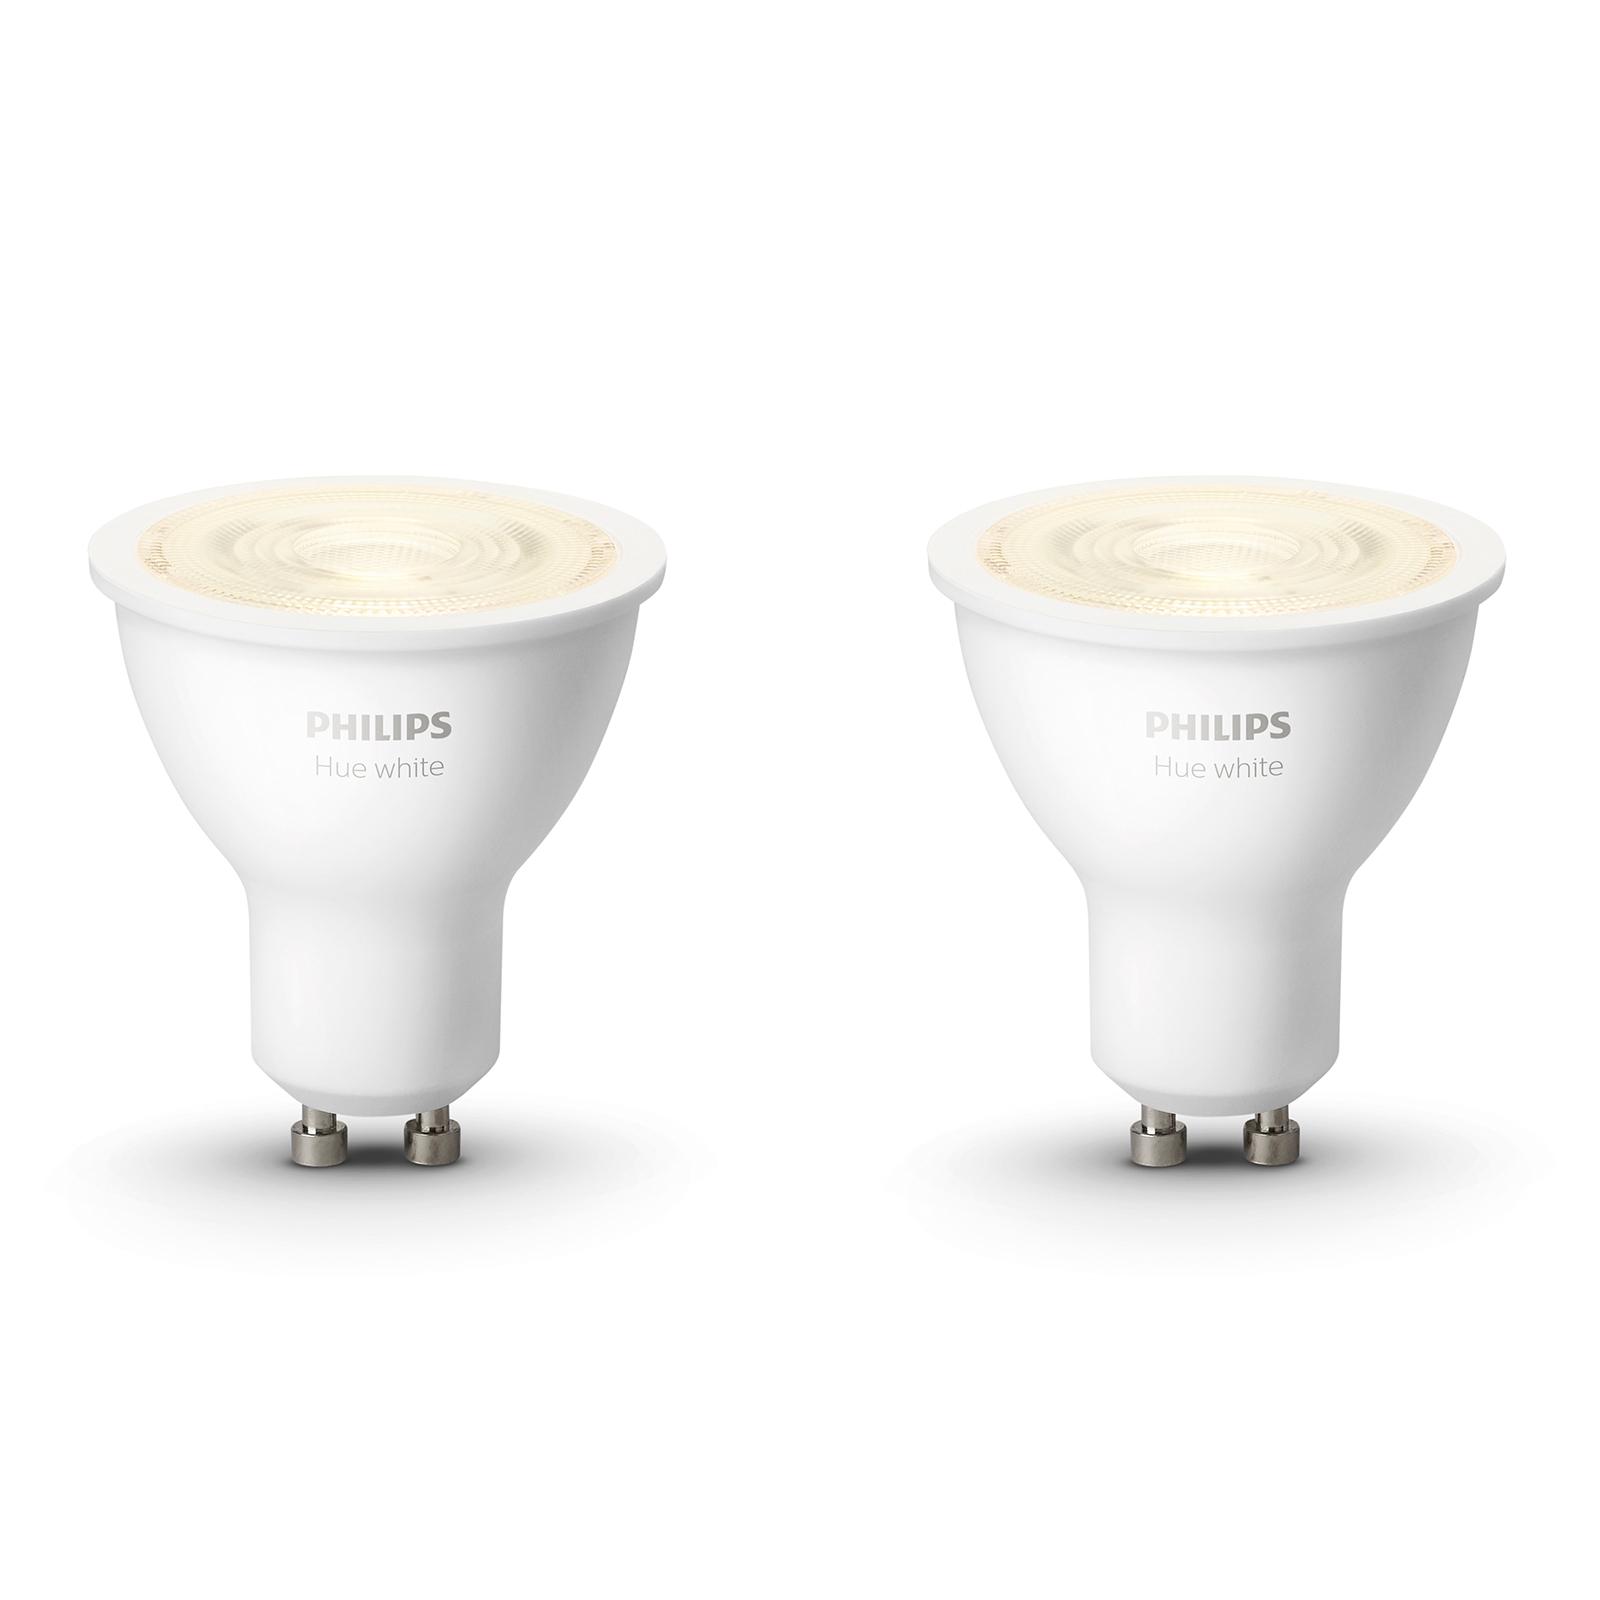 Philips Hue White 5,2 W GU10 LED lamp, 2per set